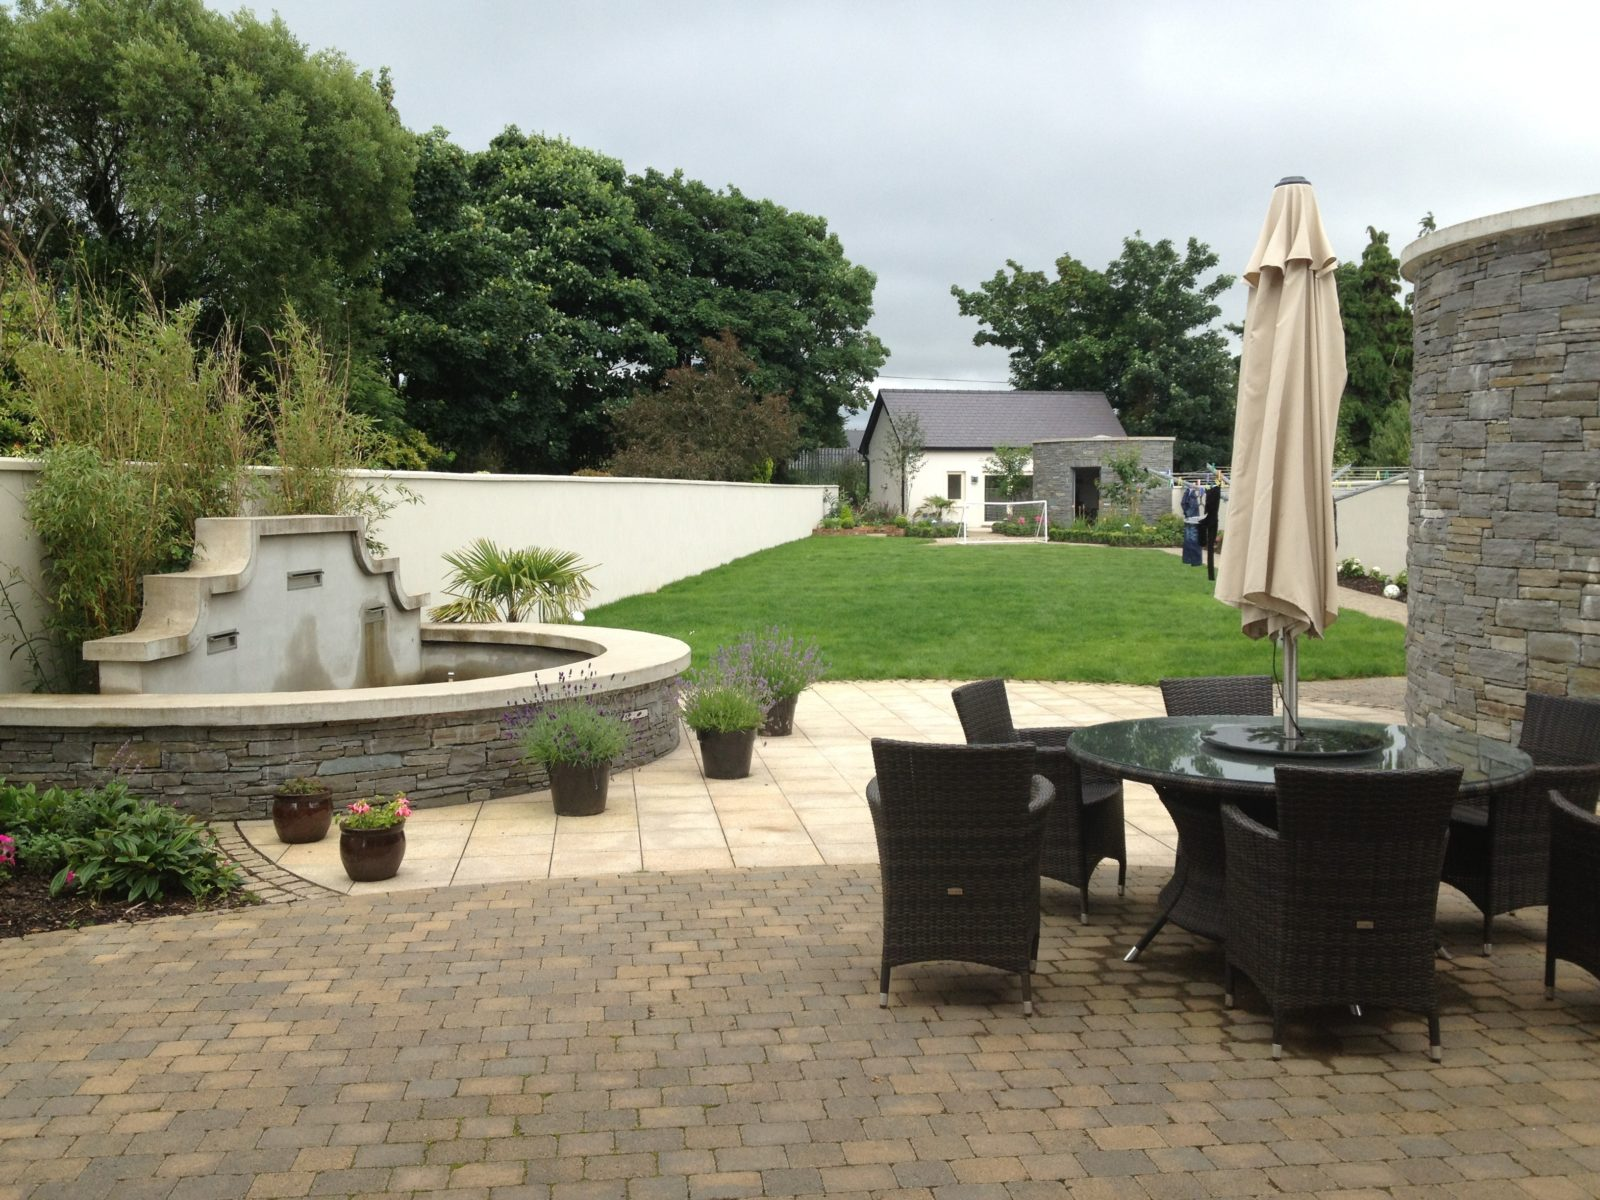 House in Killarney